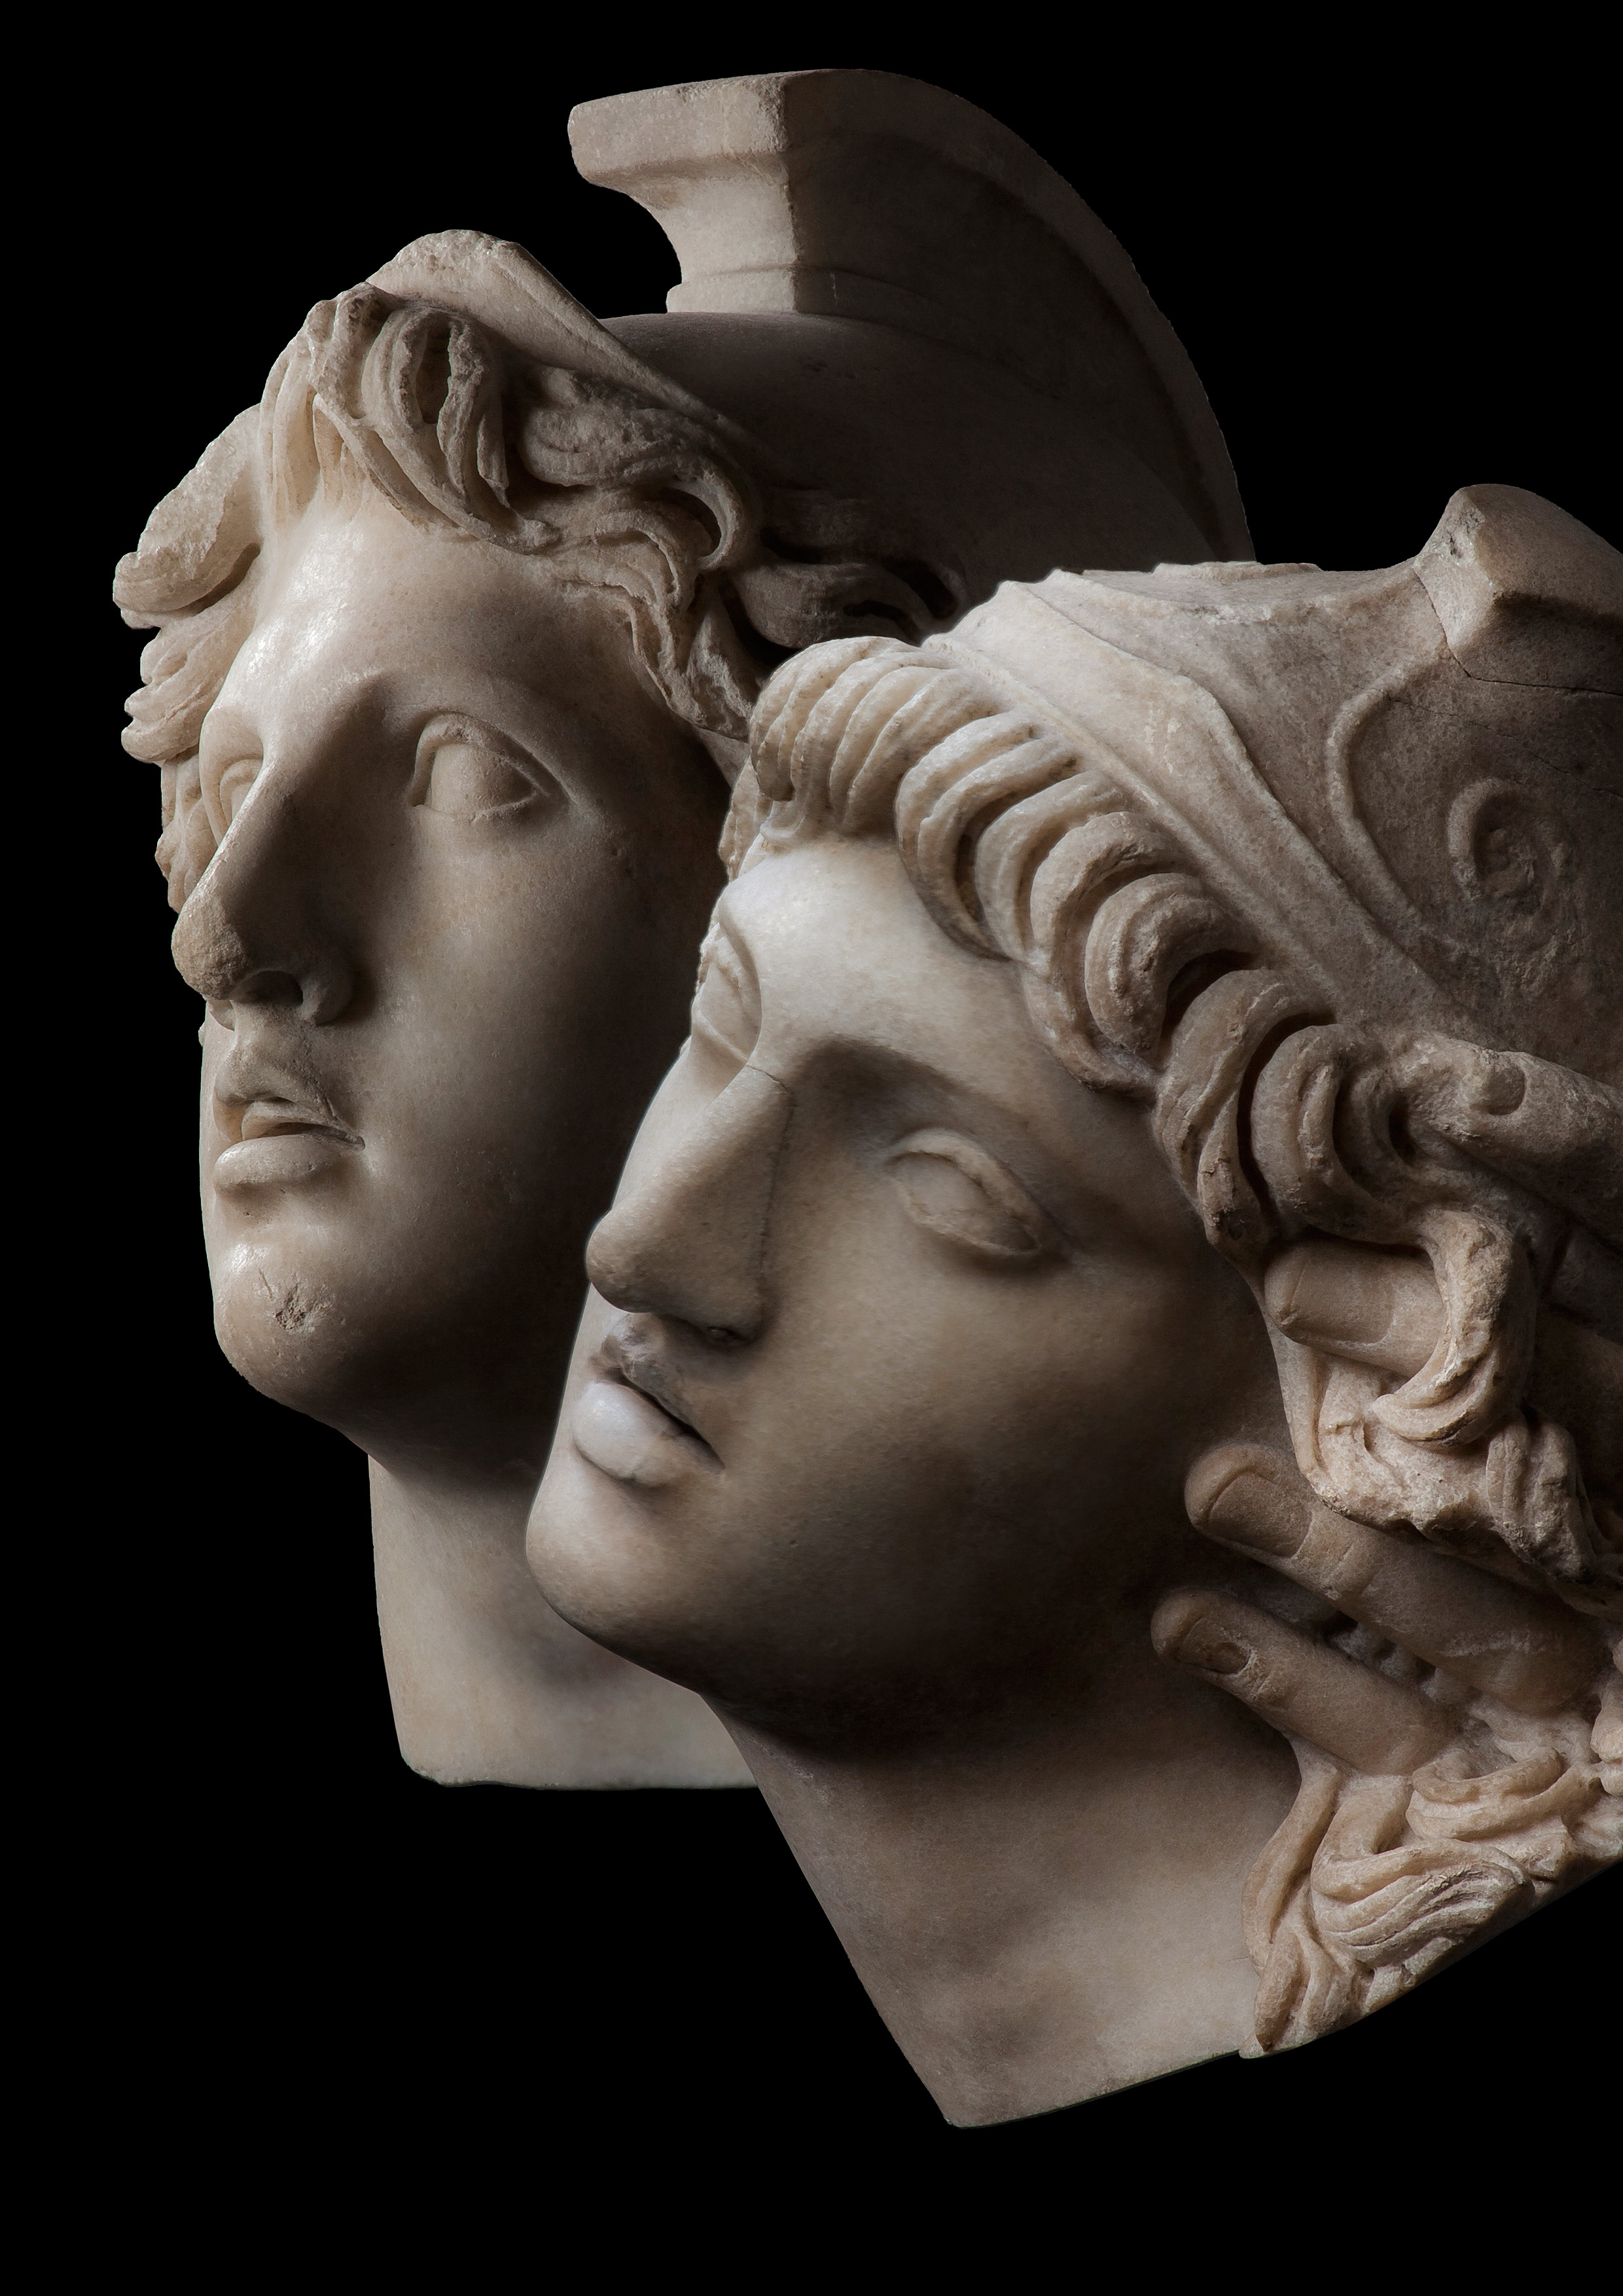 Heads of Achilles and Penthesilea. 2nd century AD, © Antikenmuseum Basel und Sammlung Ludwig, Photography Rüdi Habegger